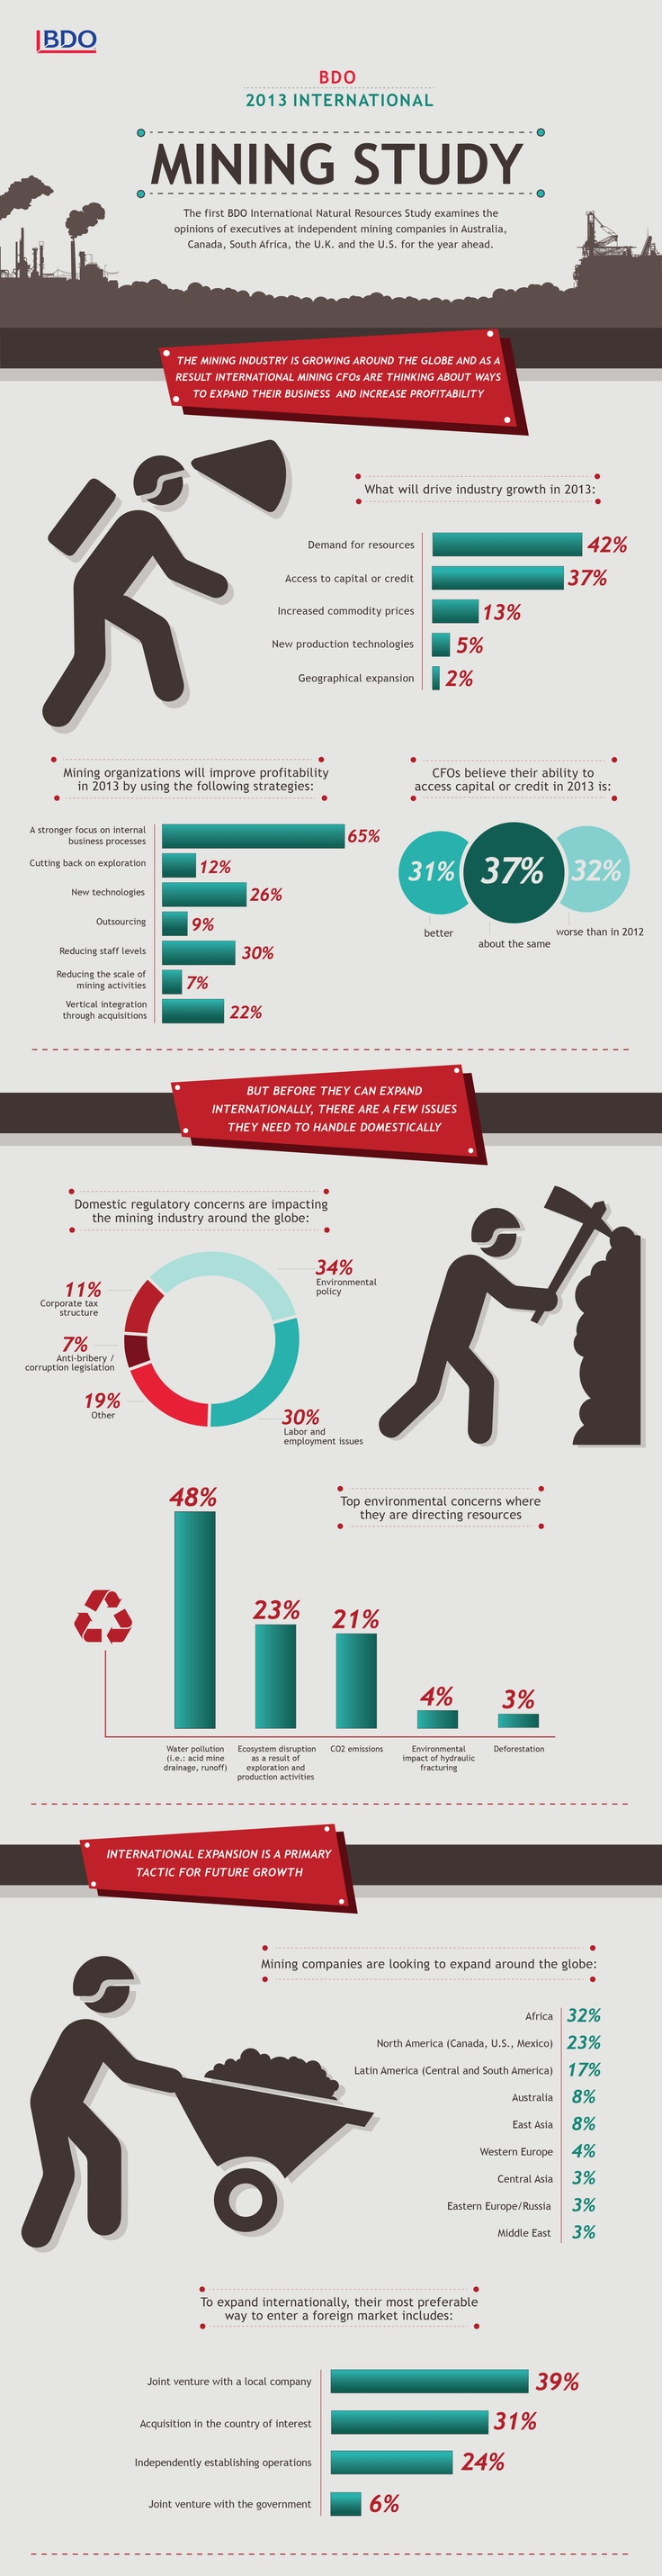 BDO 2013 International Mining Study #infographic